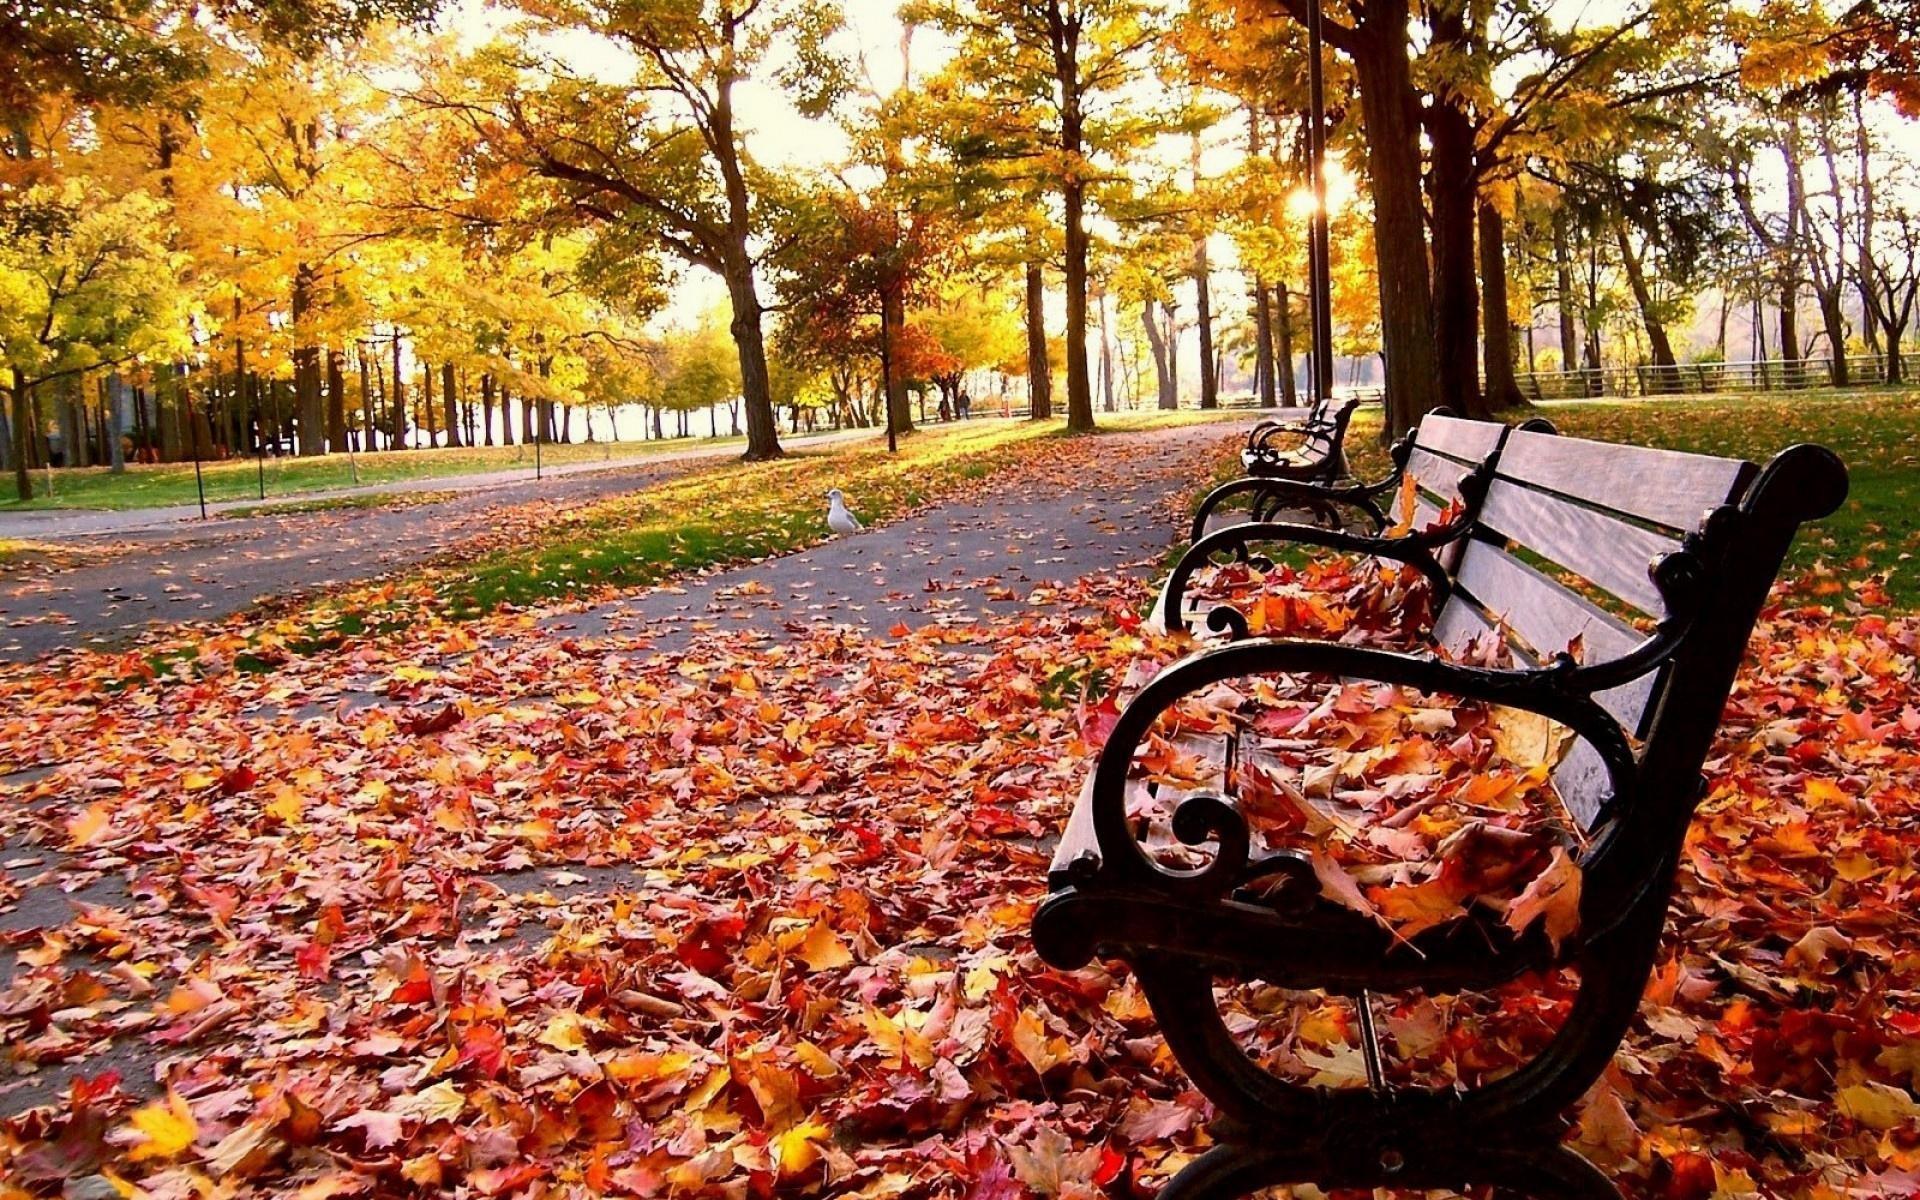 Autumn-Tumblr-HD-py-1920x-px-MB-Nature-